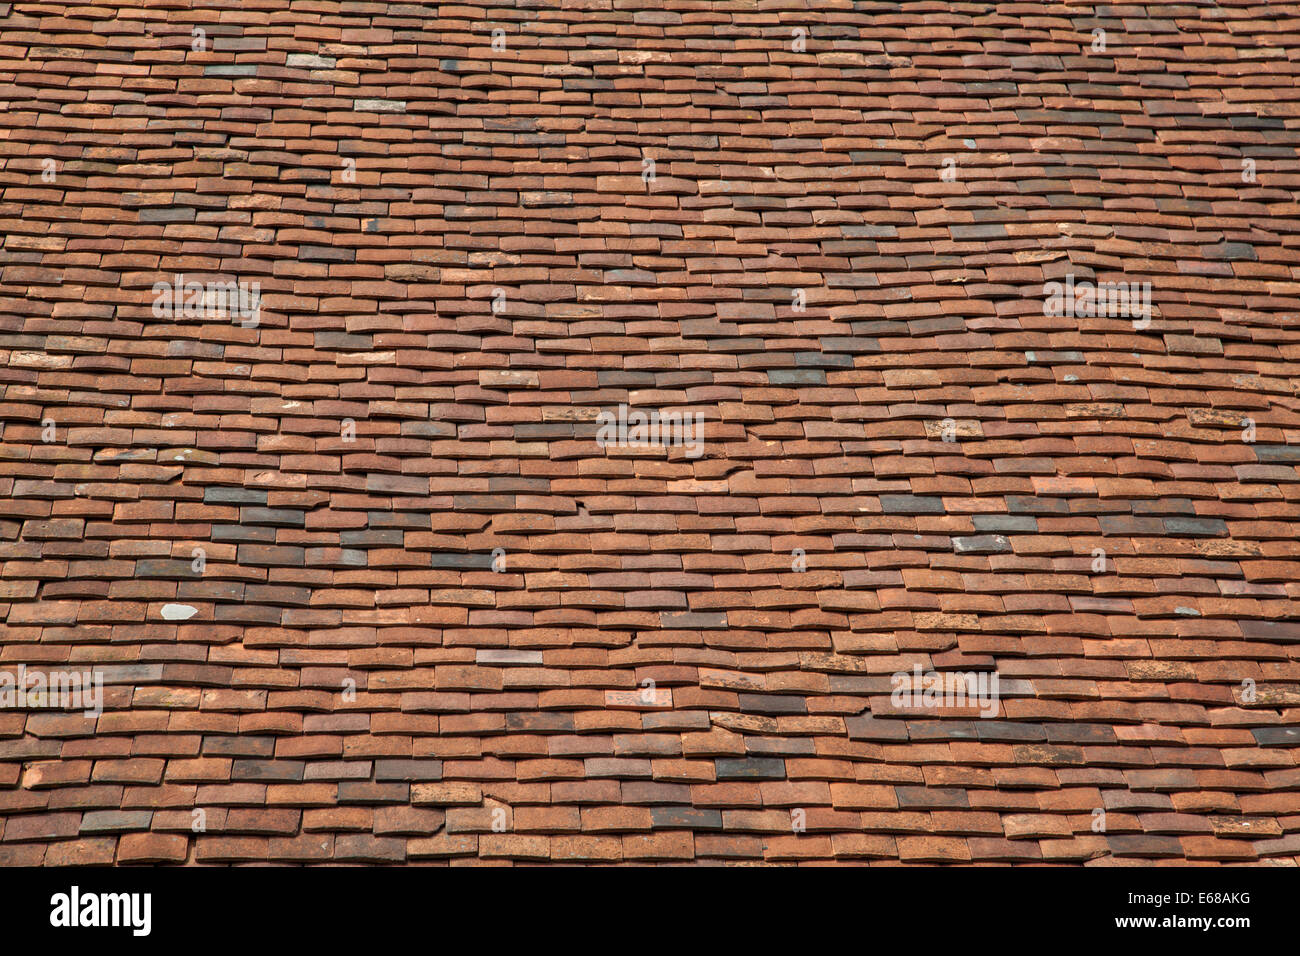 Ceramic Brown Roof Tiles On Historic Building Carisbrooke